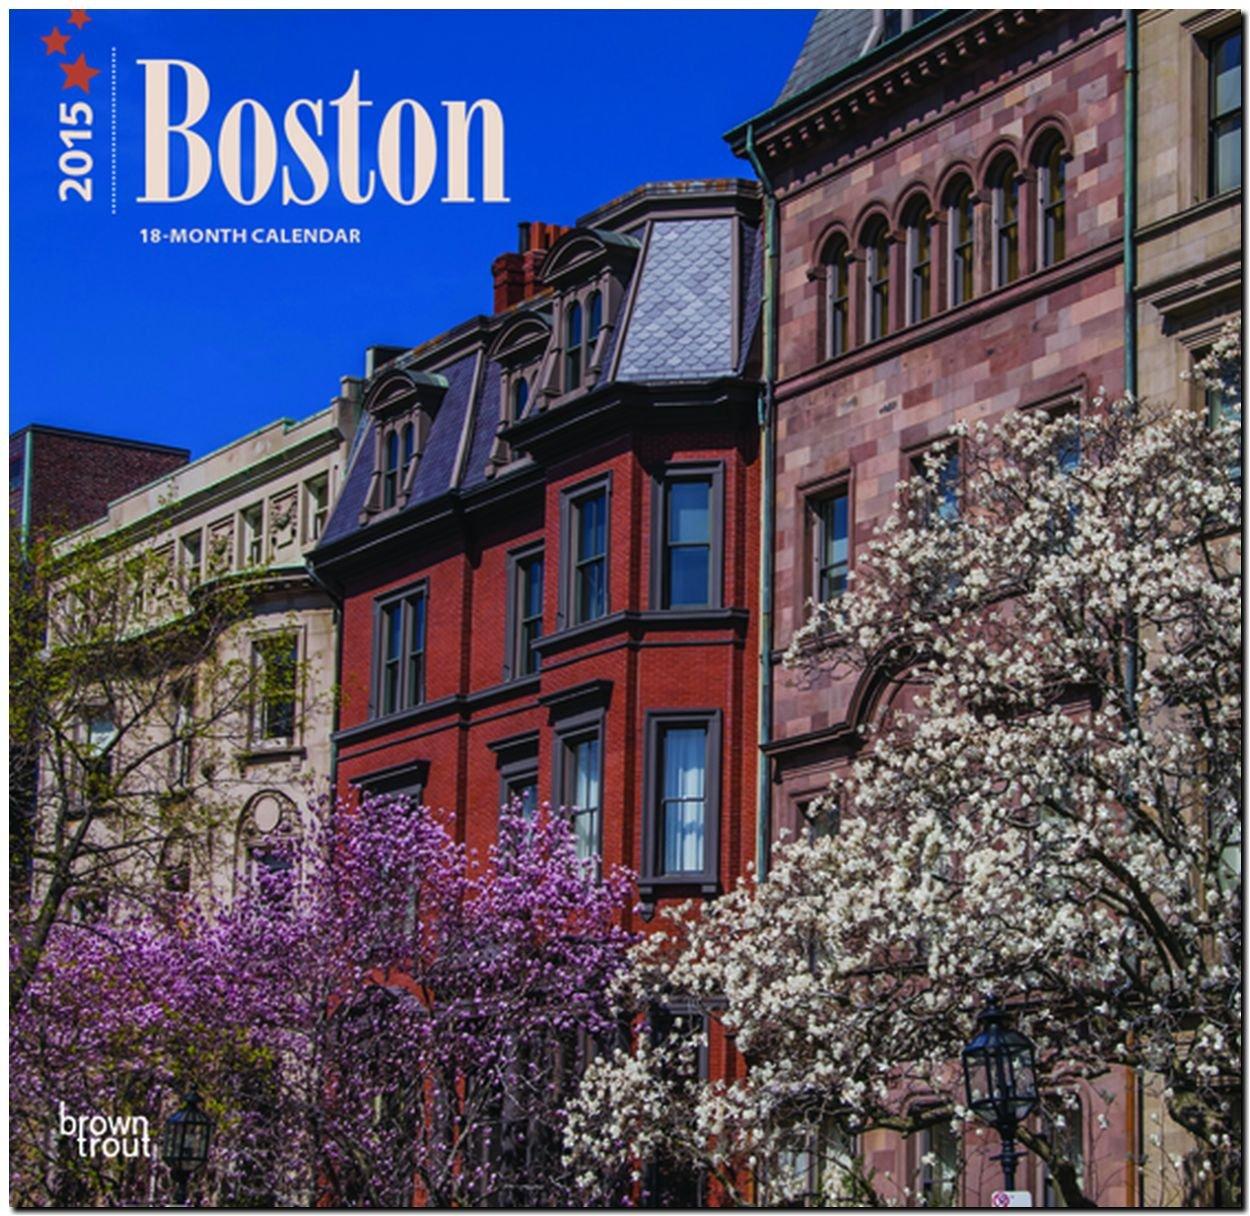 Boston 2015: Original BrownTrout-Kalender [Mehrsprachig] [Kalender]